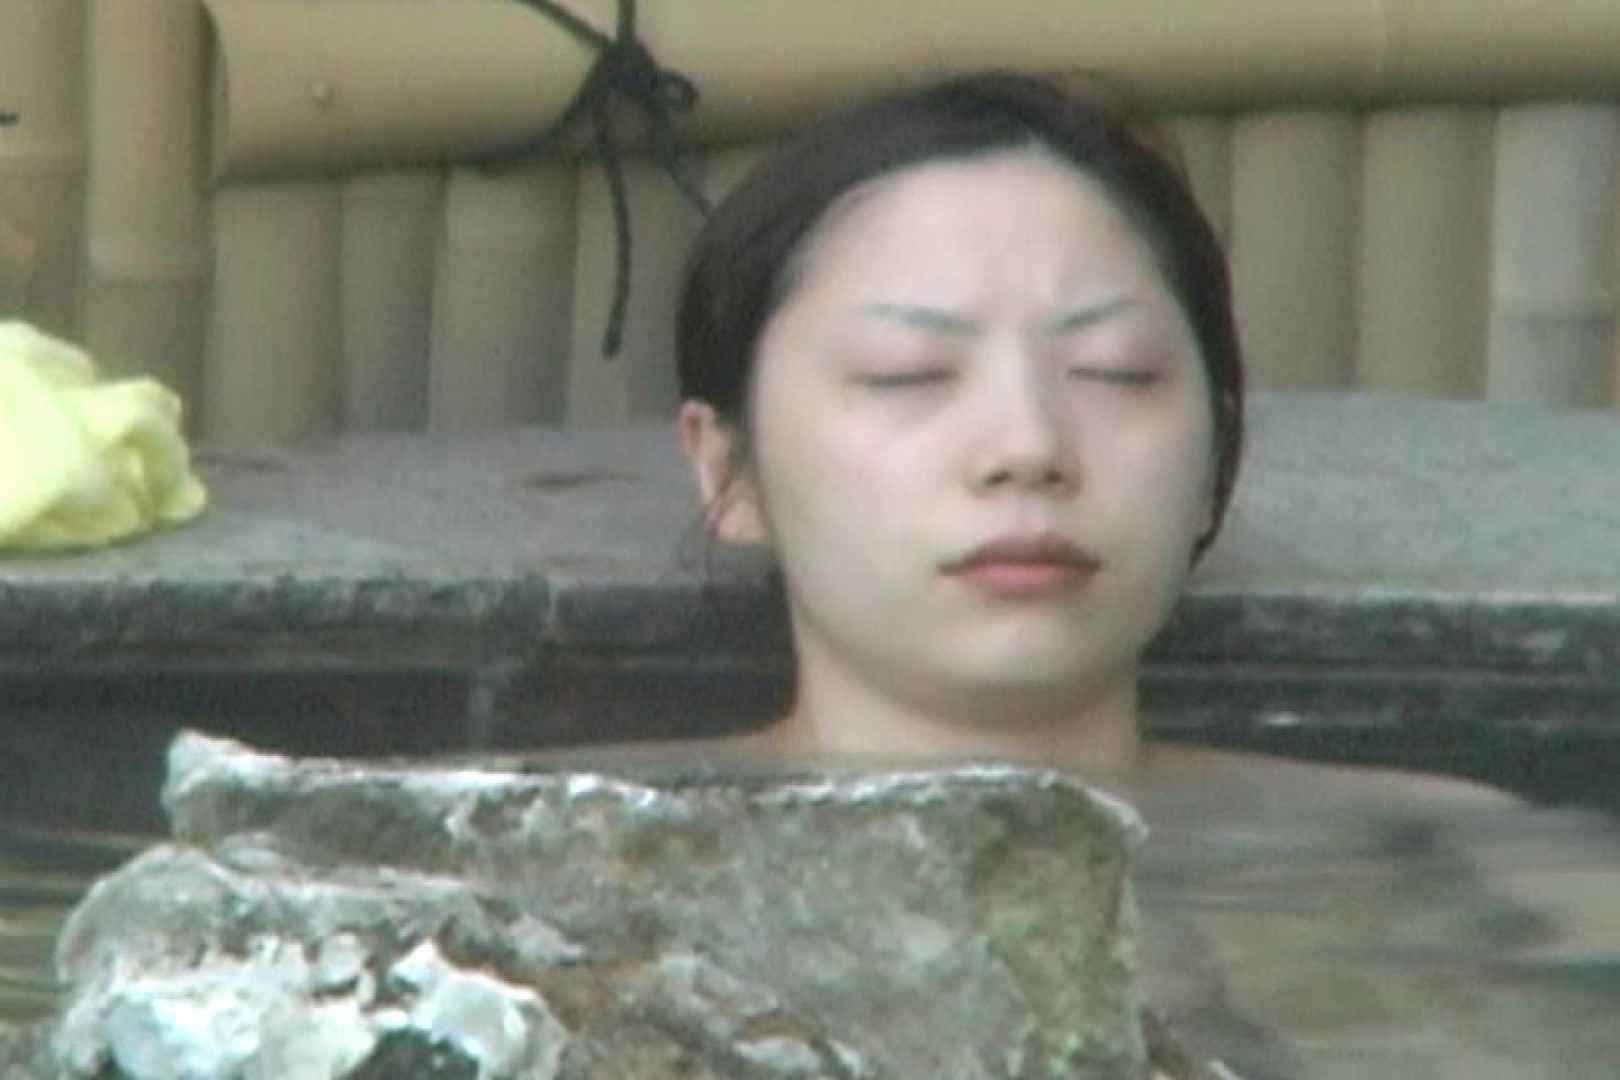 Aquaな露天風呂Vol.596 OLセックス | 盗撮  77画像 43